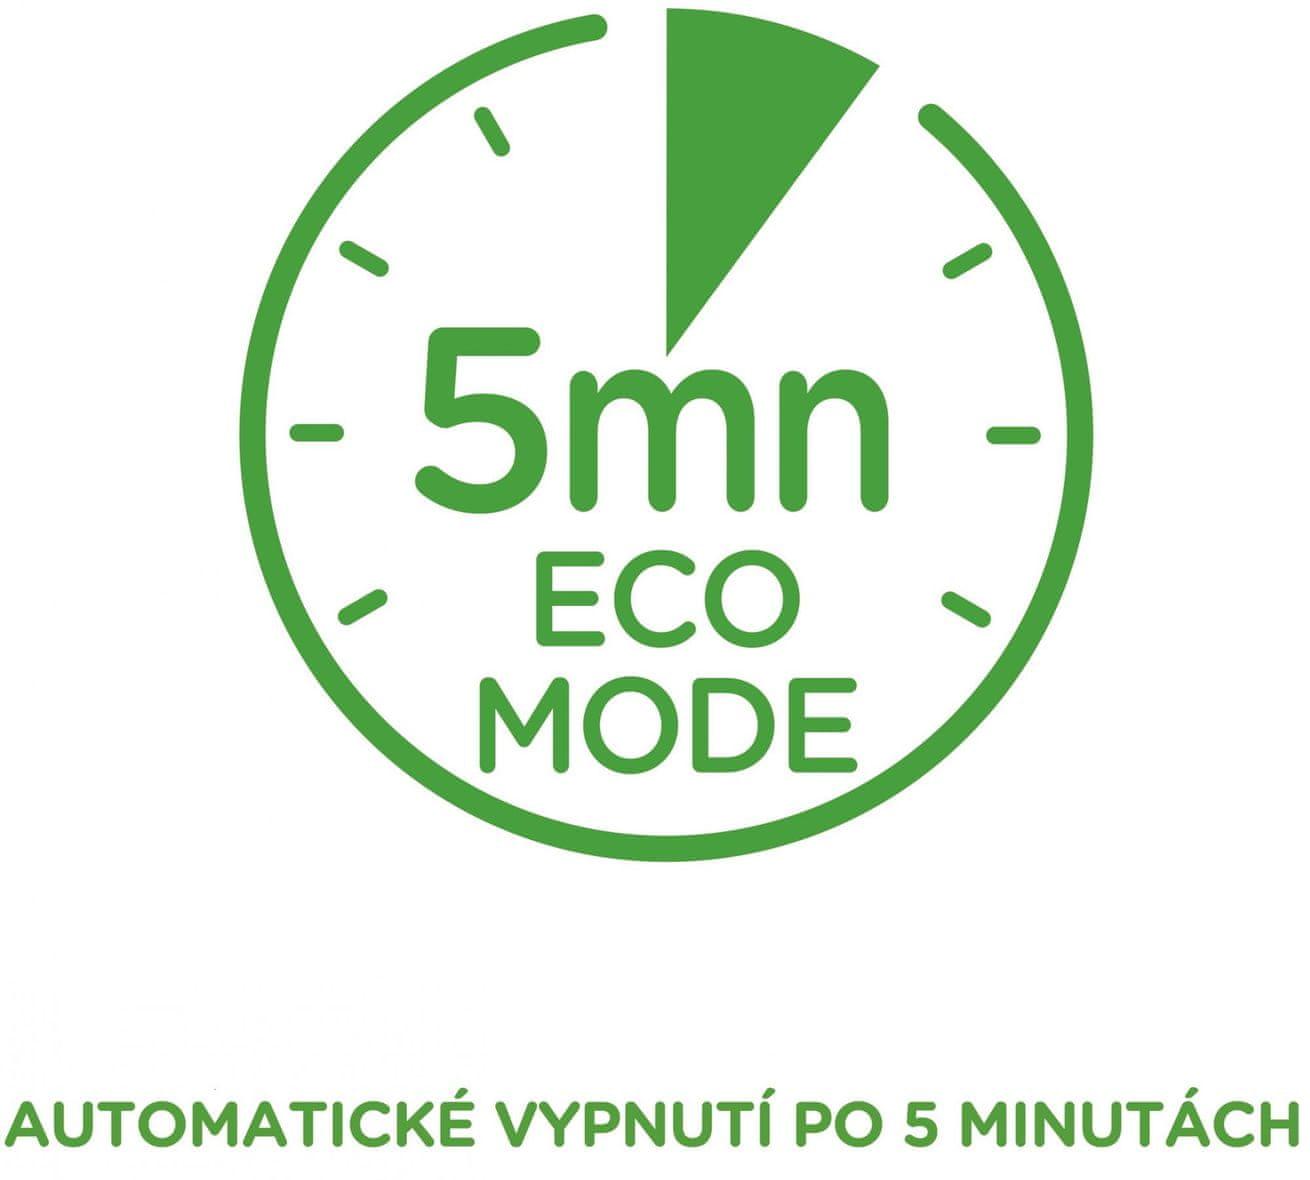 NESCAFÉ Dolce Gusto Mini Me energeticky úsporný režim